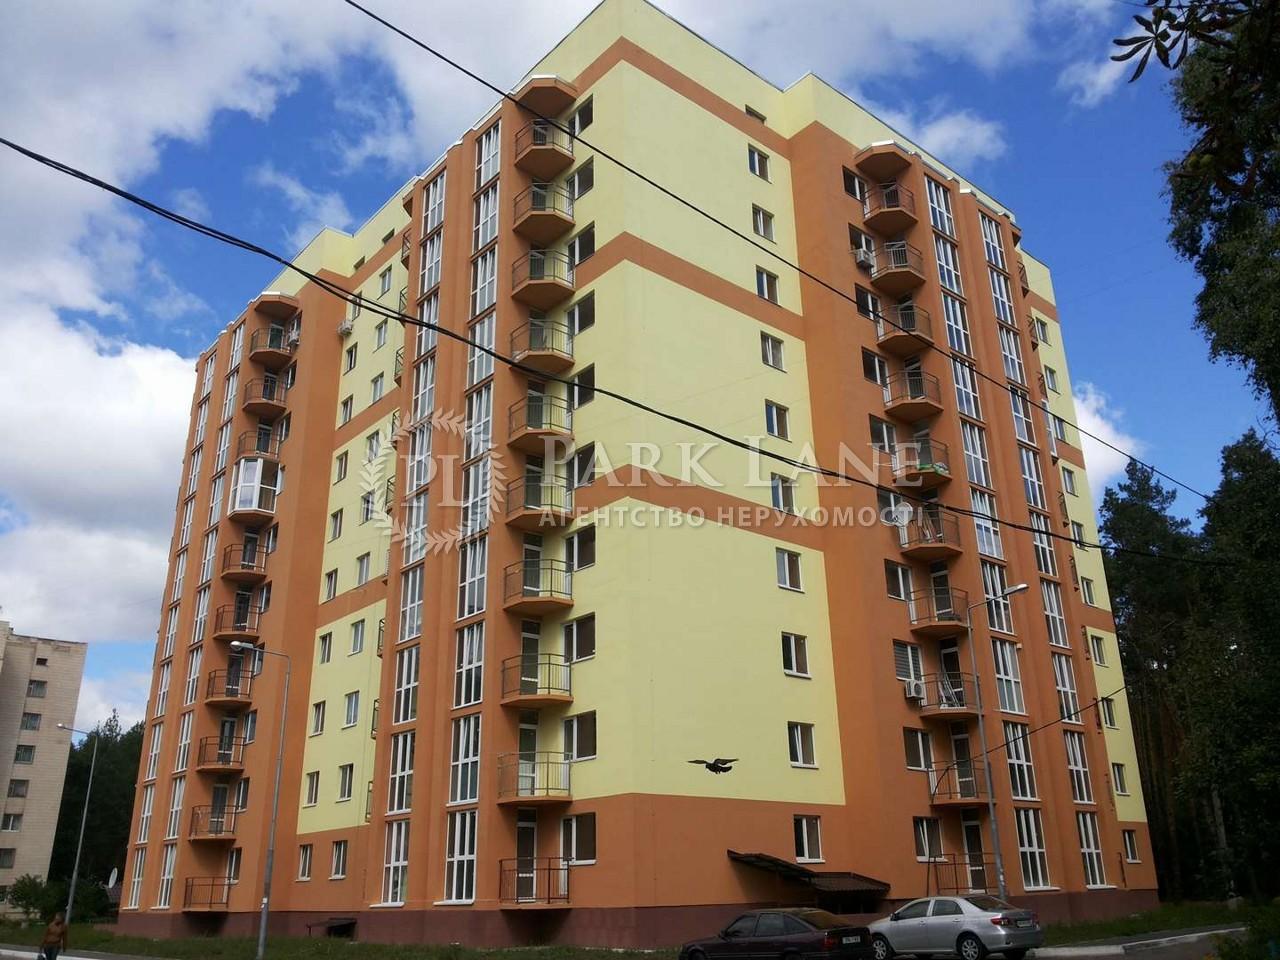 Квартира B-91429, Матыкина Генерала, 16, Киев - Фото 1